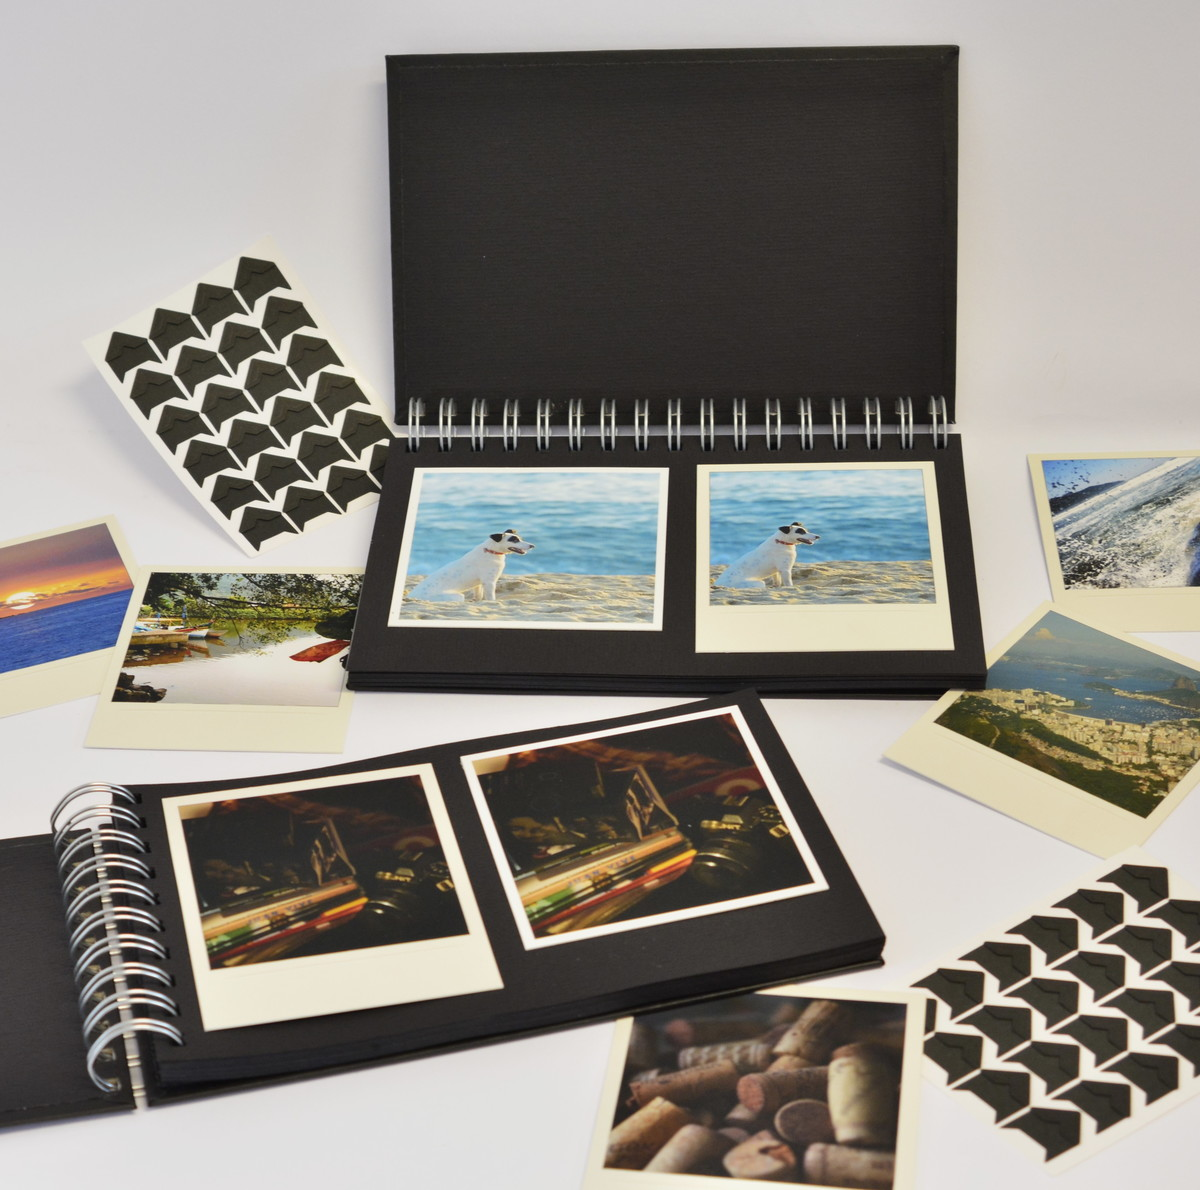 album para fotos polaroid ou instagram diversas cores no elo7 gaivotha ateli de. Black Bedroom Furniture Sets. Home Design Ideas